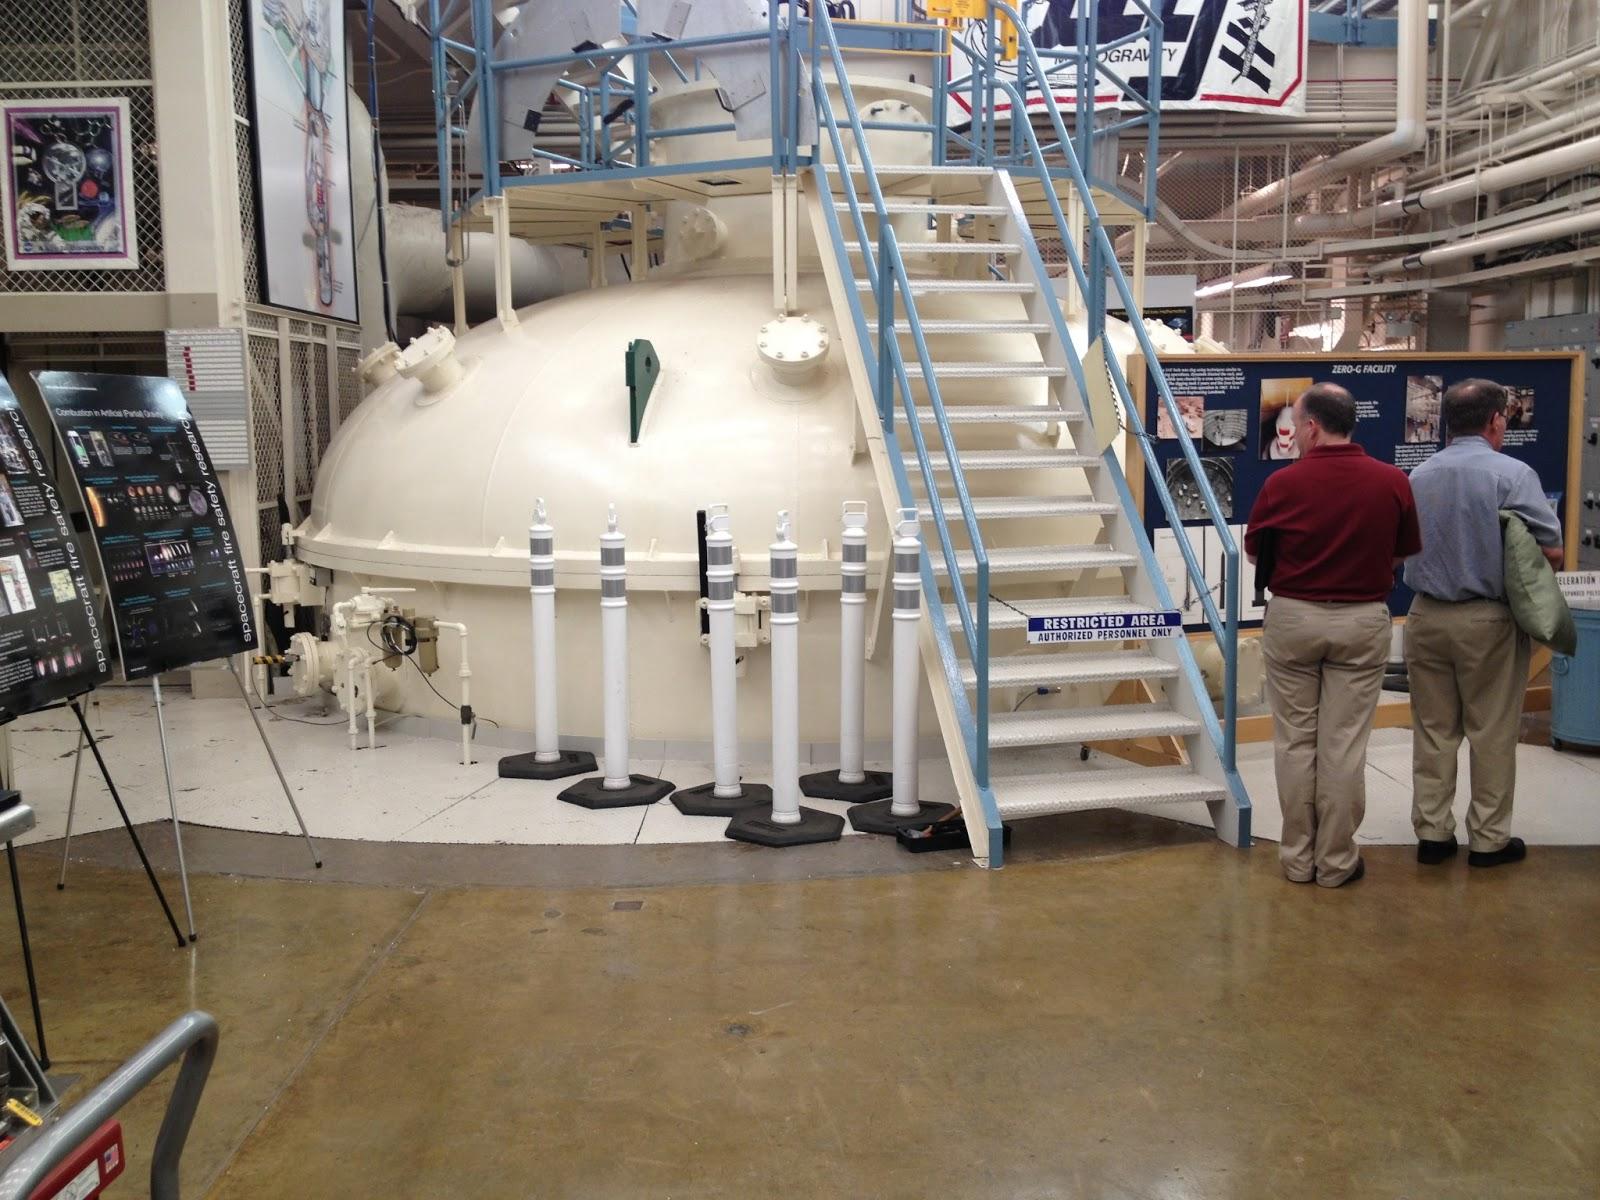 Section 106 in Ohio: NASA John Glenn Research Center